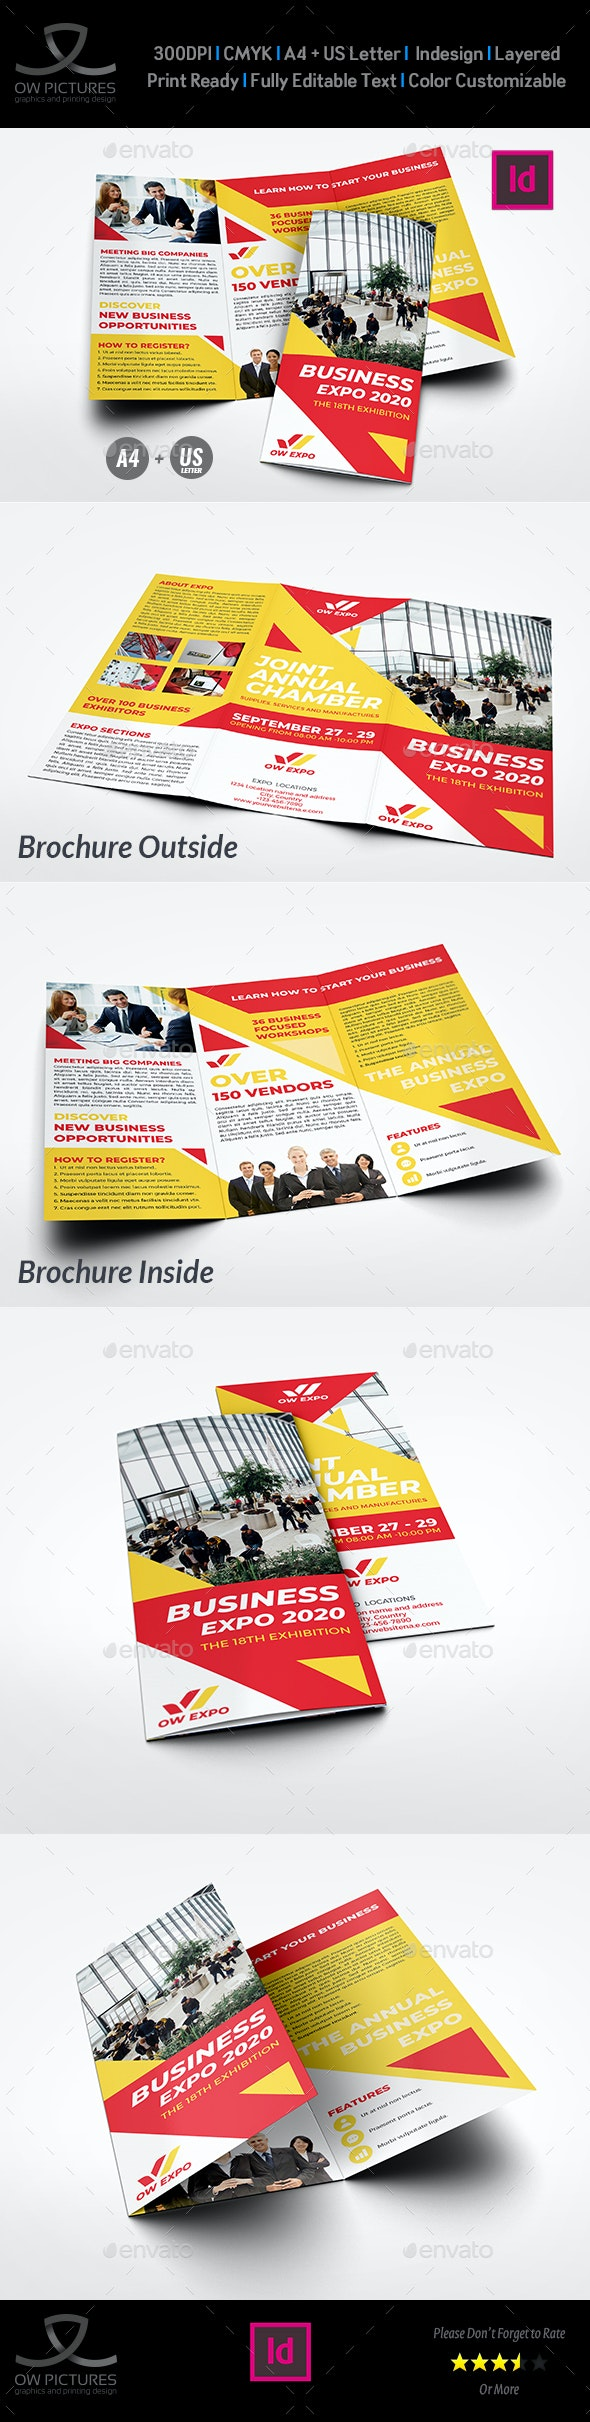 Business Exhibition Tri-Fold Brochure Template - Brochures Print Templates